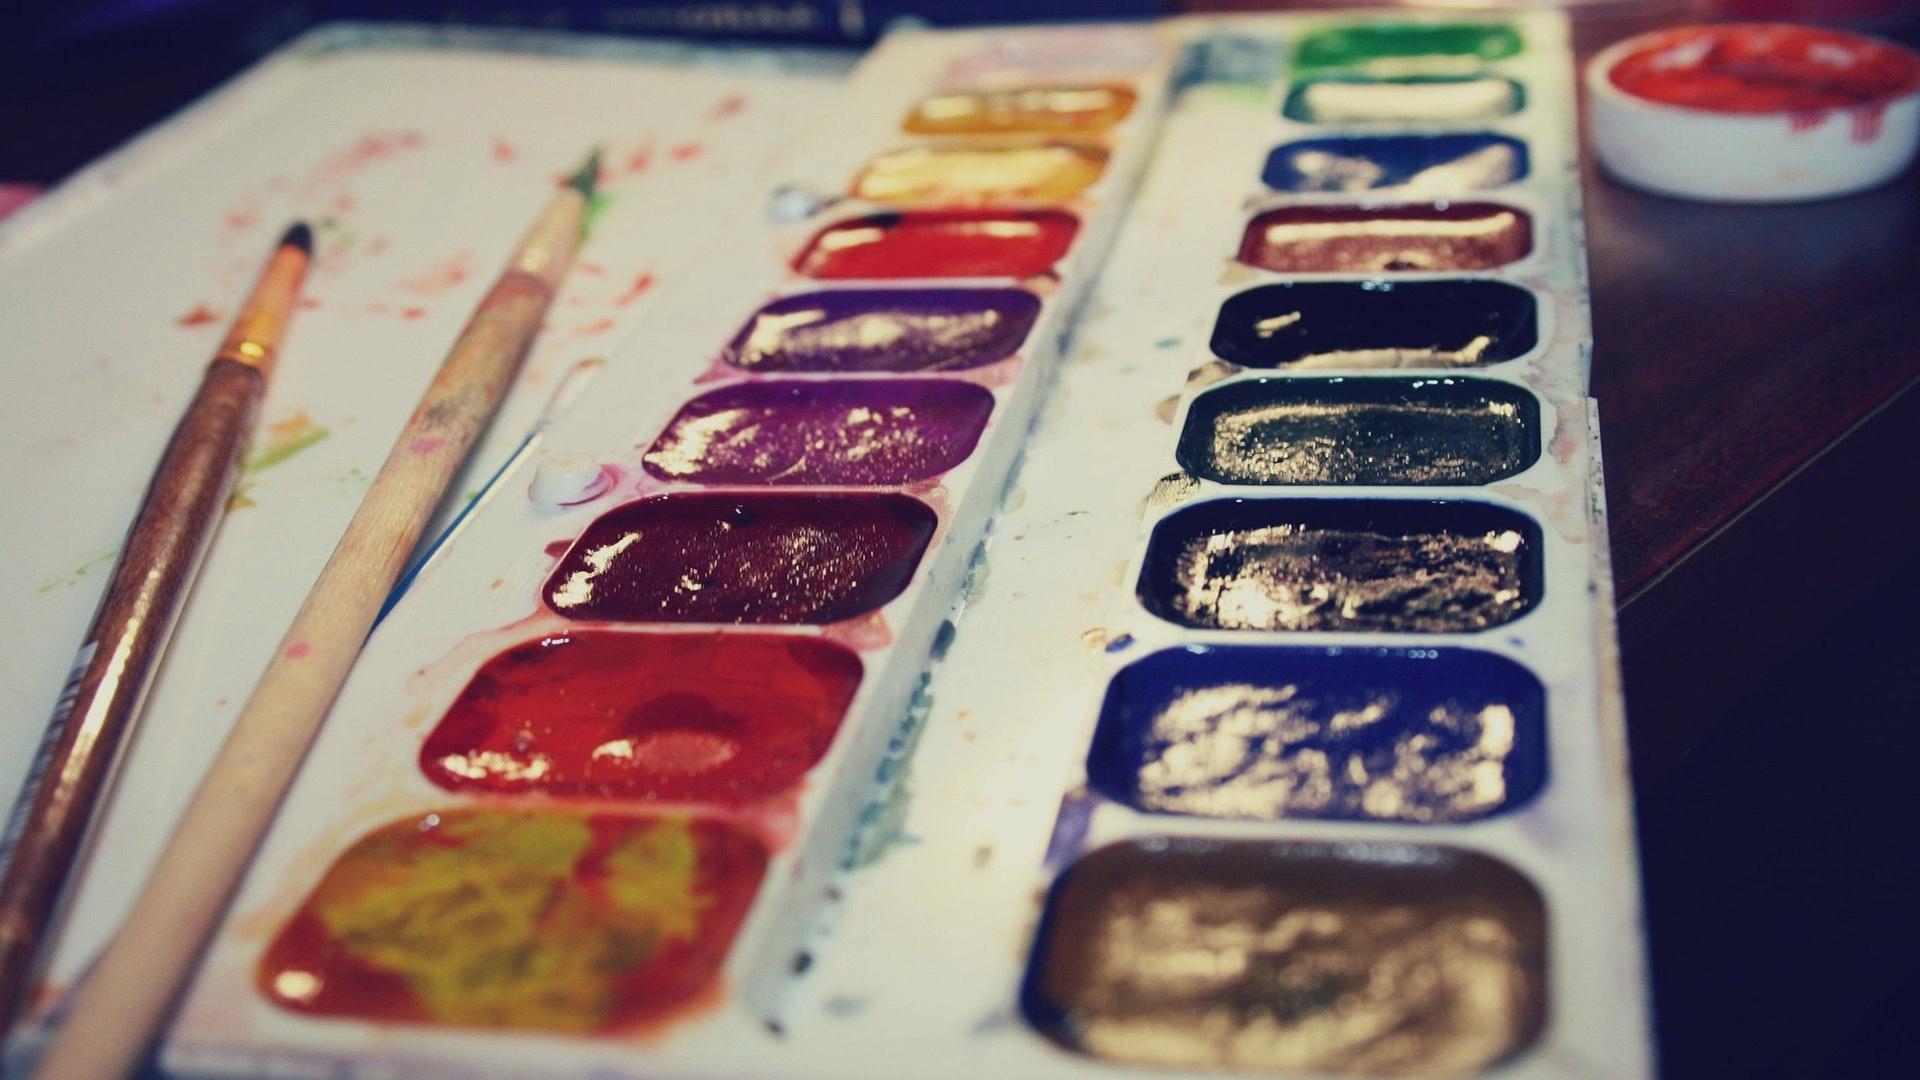 Brushes And Paint desktop wallpaper hd